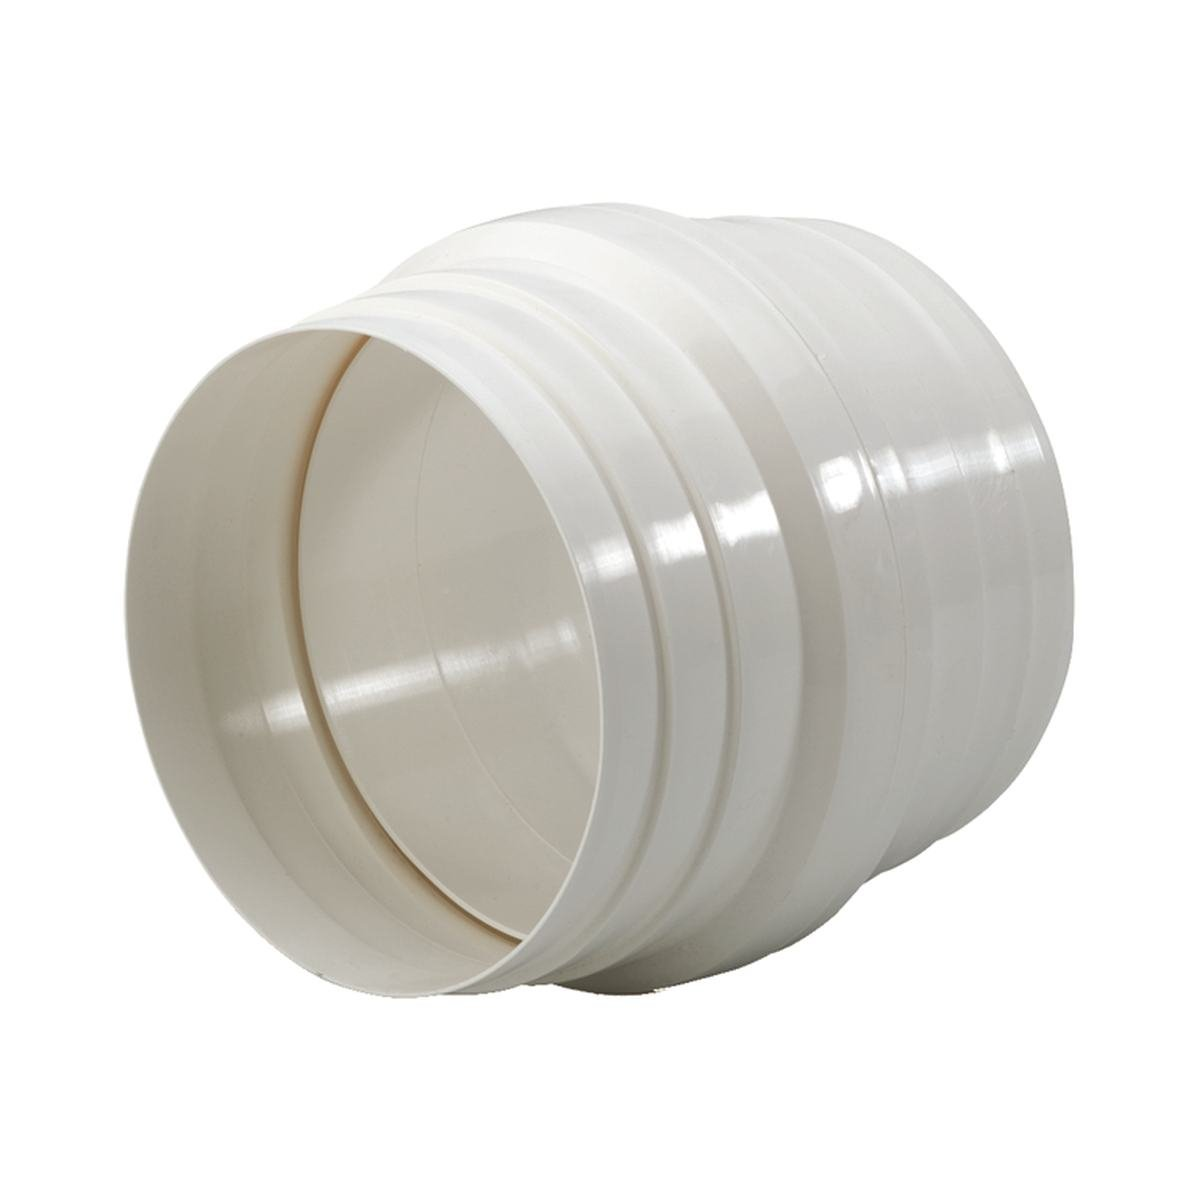 Vannlås / kondensfælde Ø150 mm.